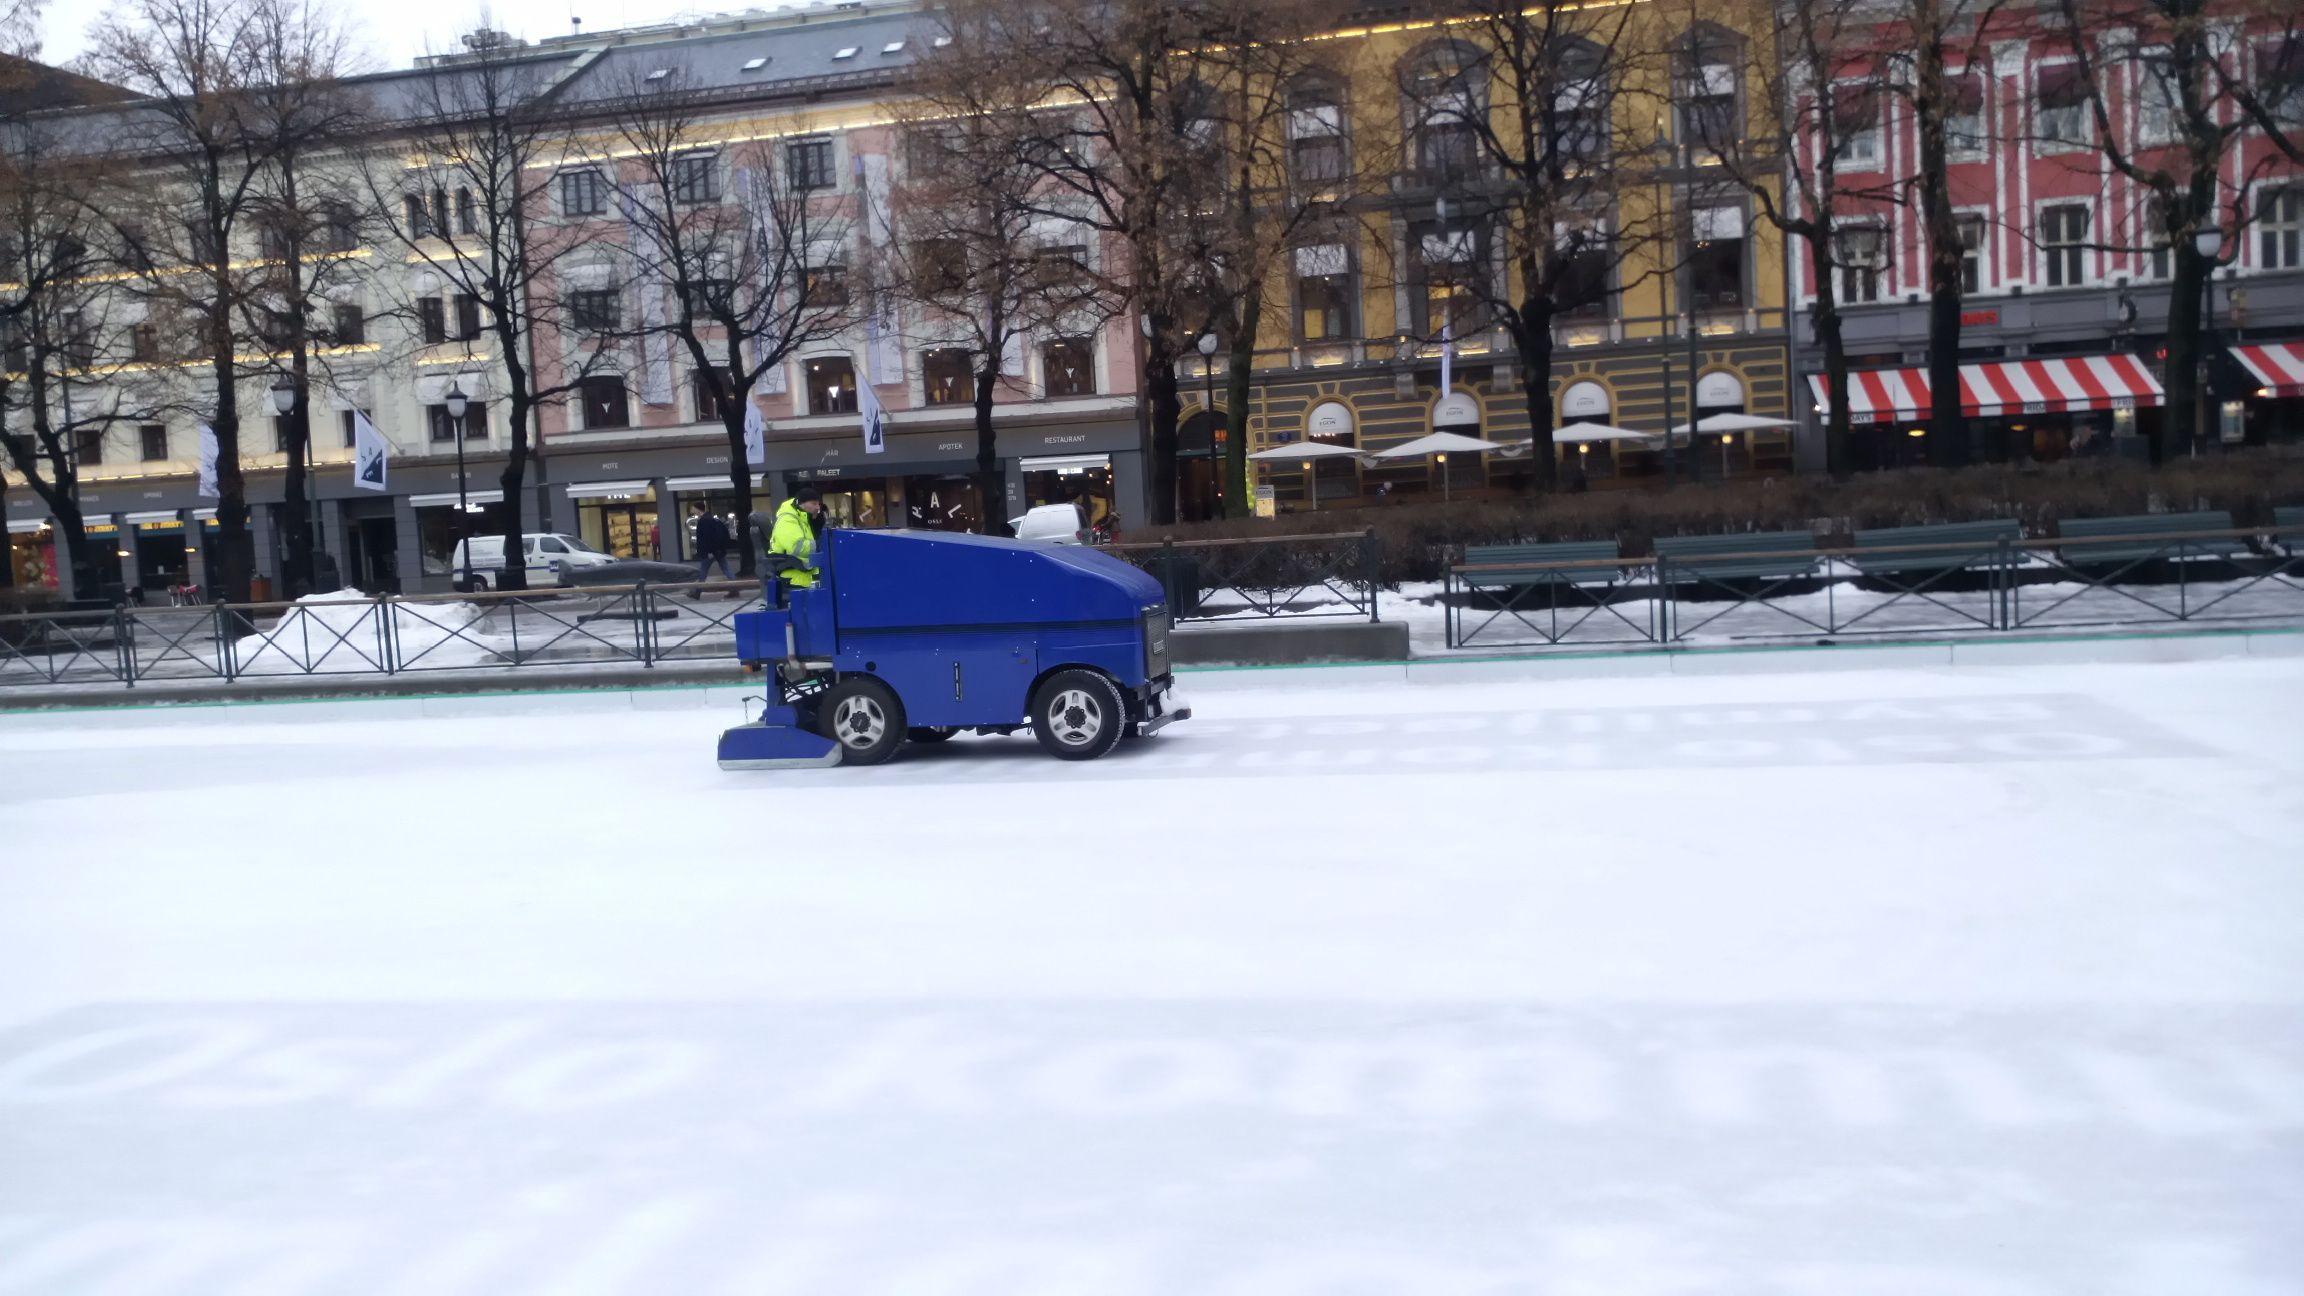 Isen holdes i sjakk, midt i Oslo-sentrum. Foto: Ole Henrik Johansen / Tek.no